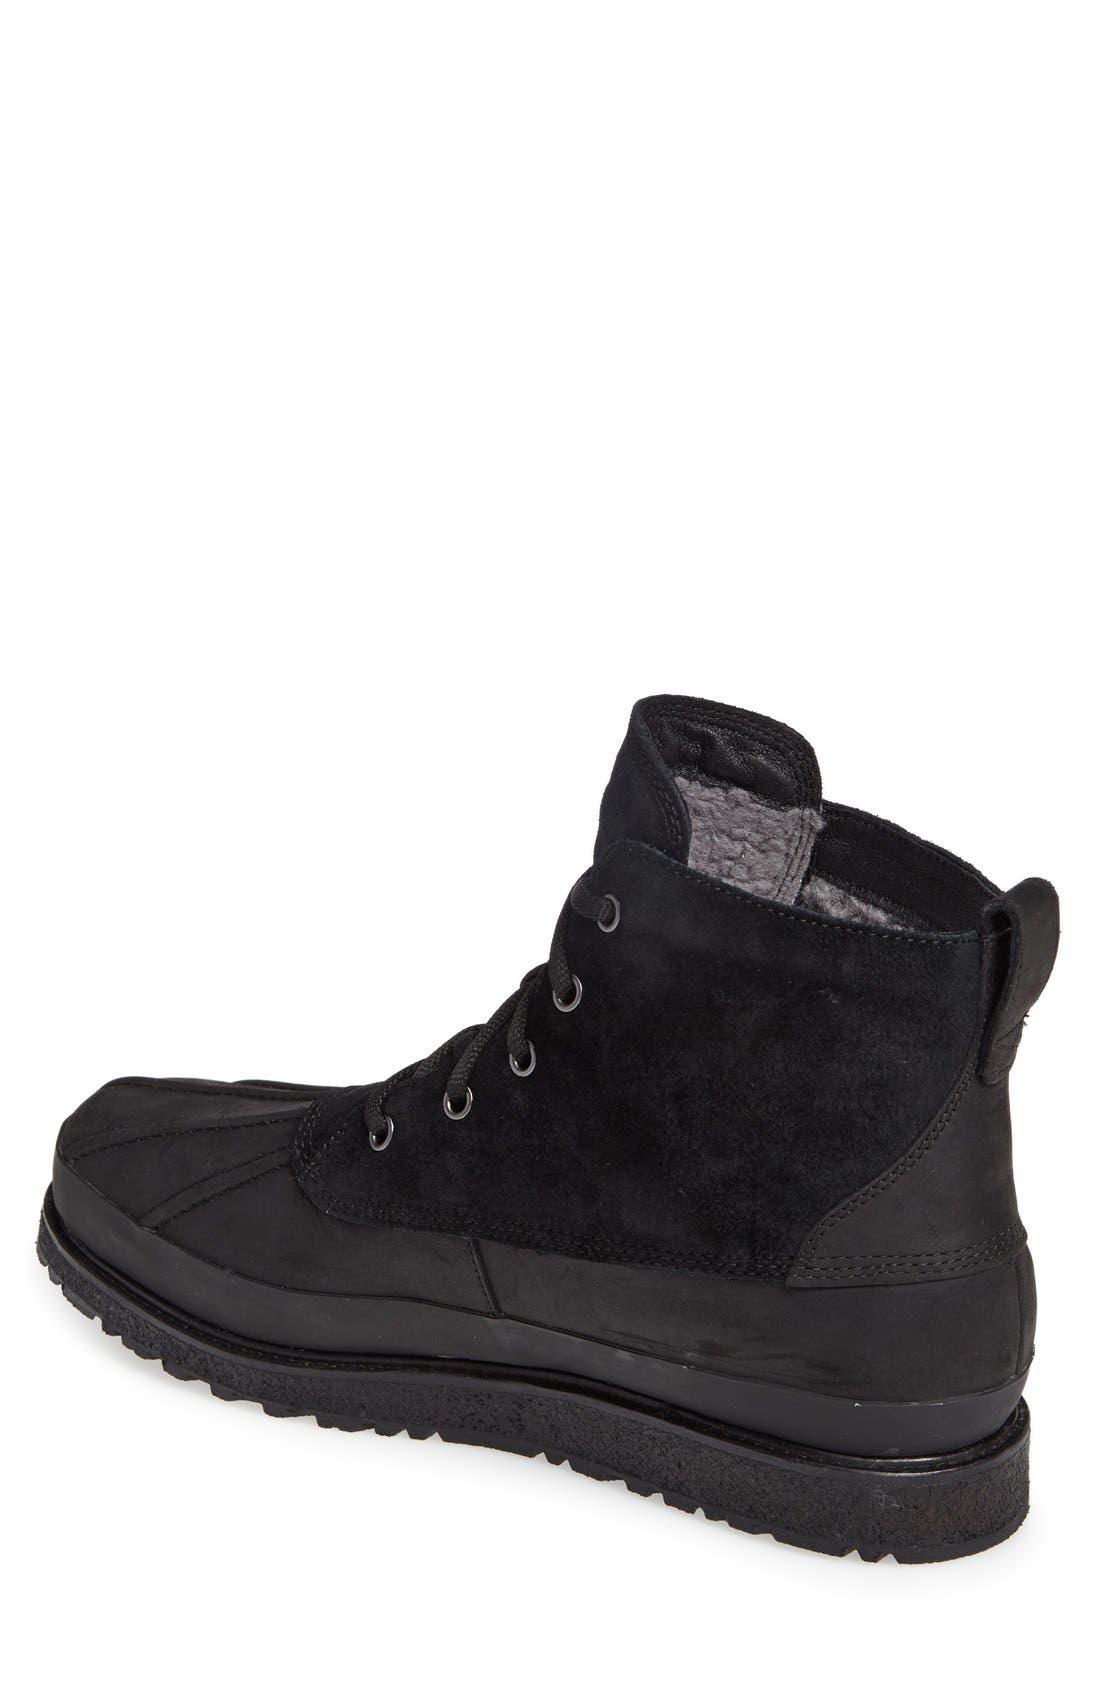 Alternate Image 2  - UGG® Fairbanks Waterproof Boot (Men)